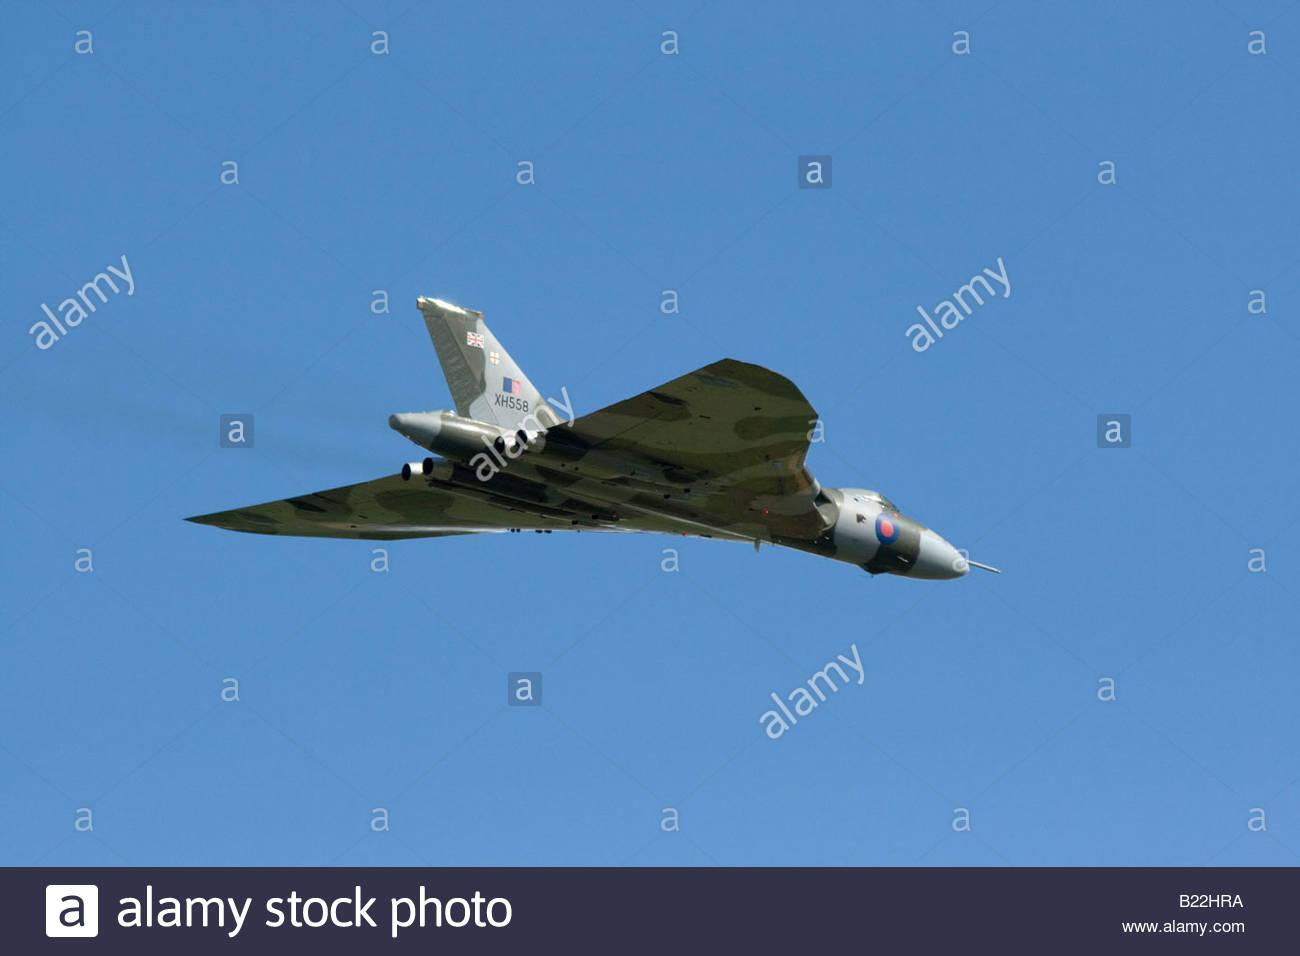 Vulcan Bombardero de la Guerra Fría contra un cielo azul Imagen De Stock